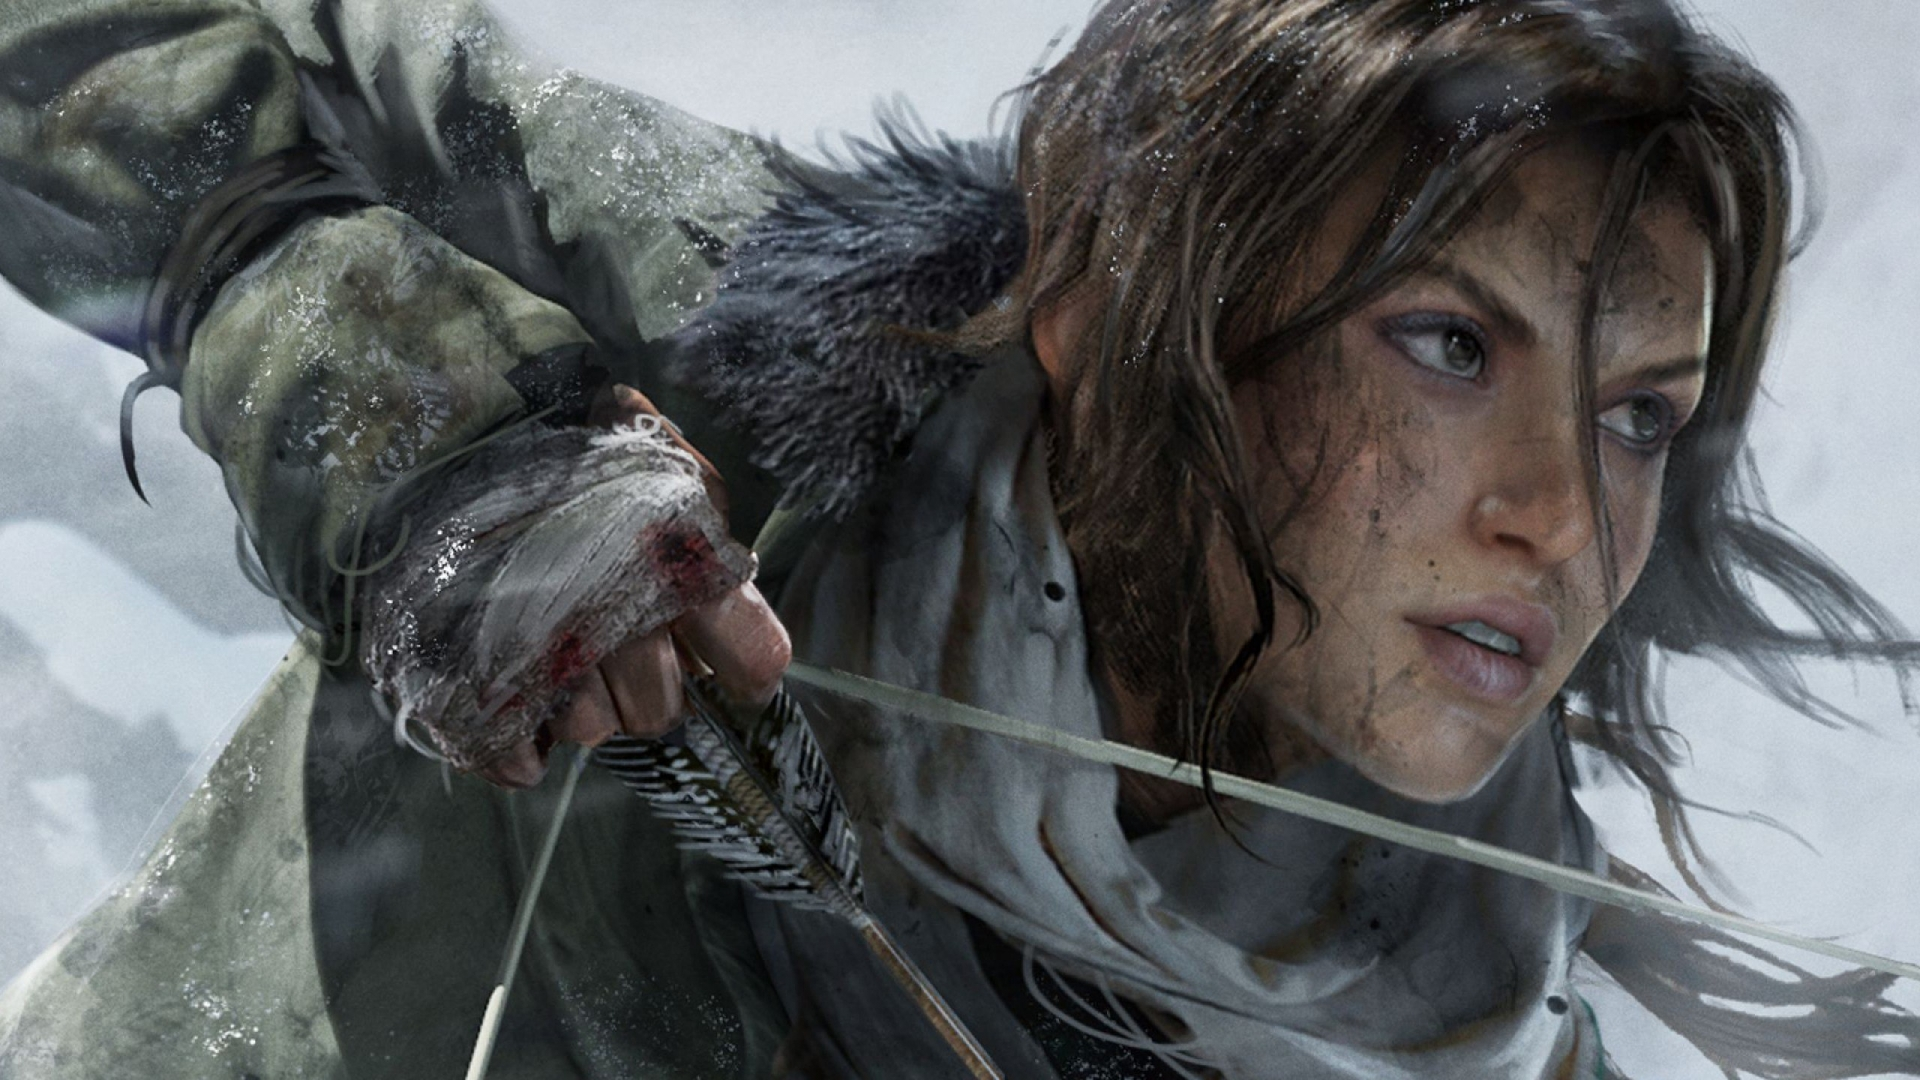 Ambientes hostis para Rise of The Tomb Raider